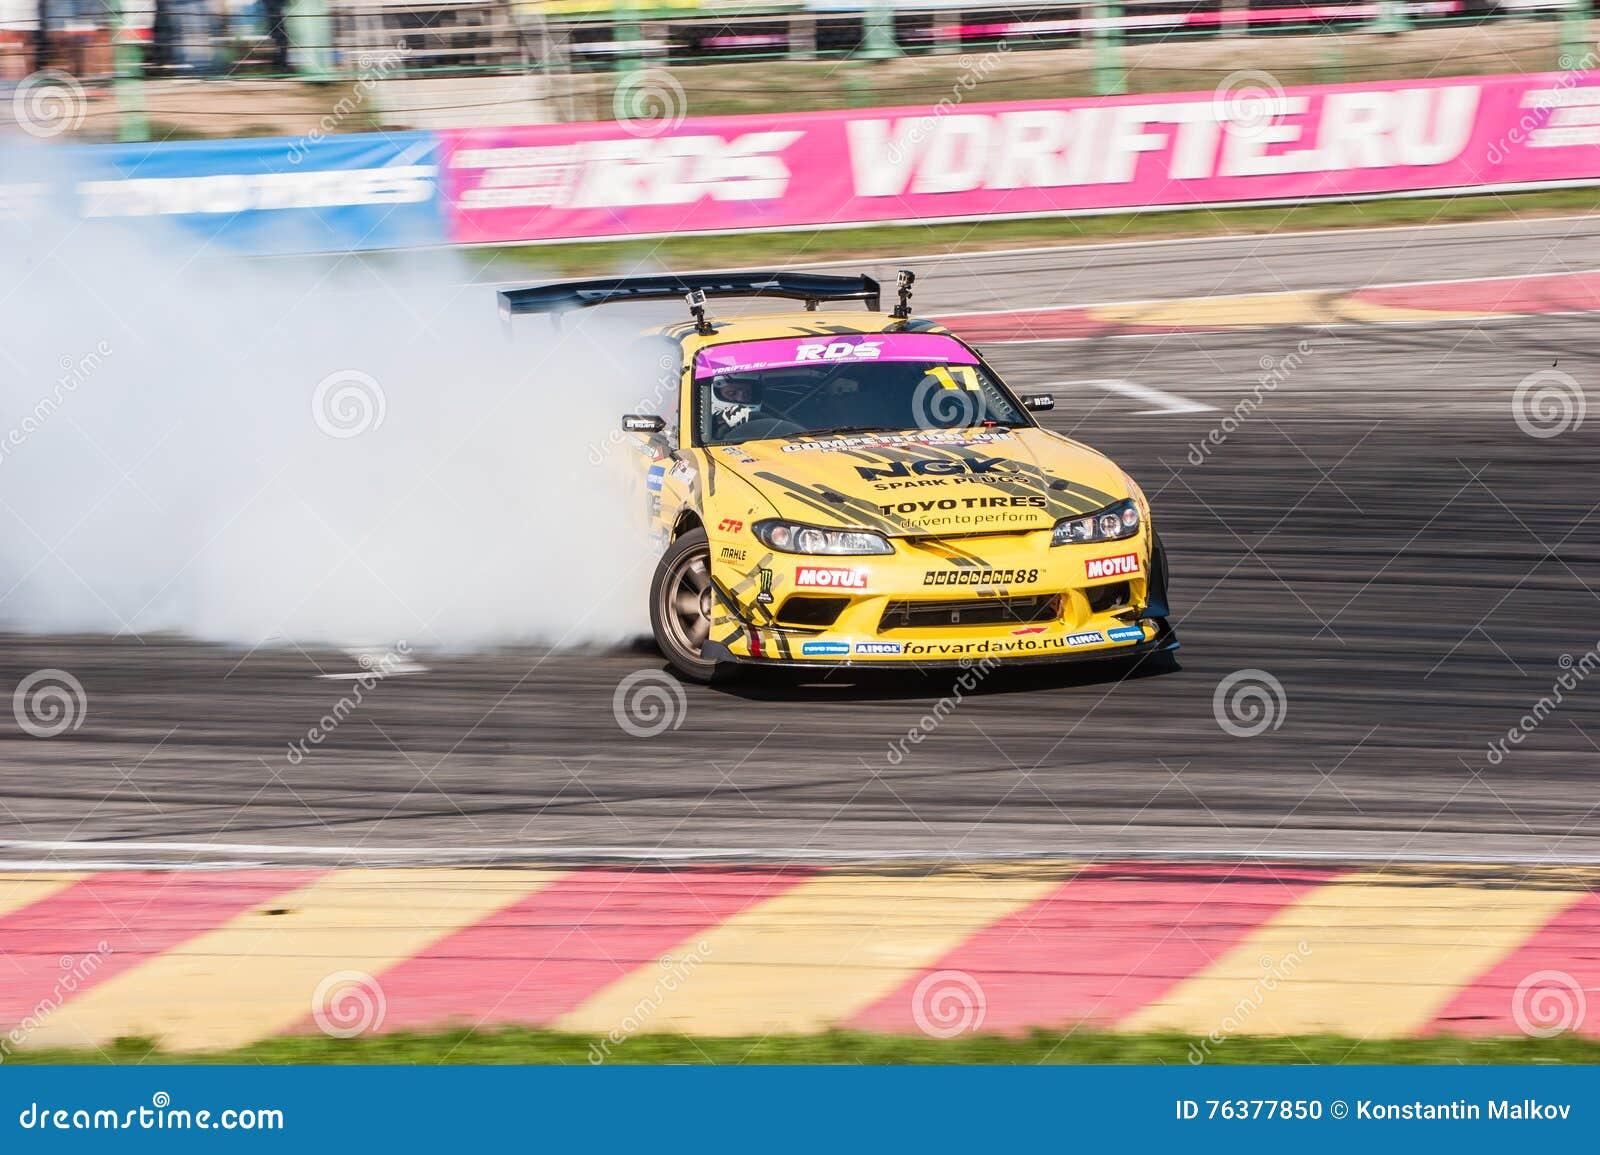 Nizhny Novgorod Russia Aug 20, 2016 : Russian Drift Series Stage 5 RDS Zapad West Chivchyan George Gocha. Nissan Silvia